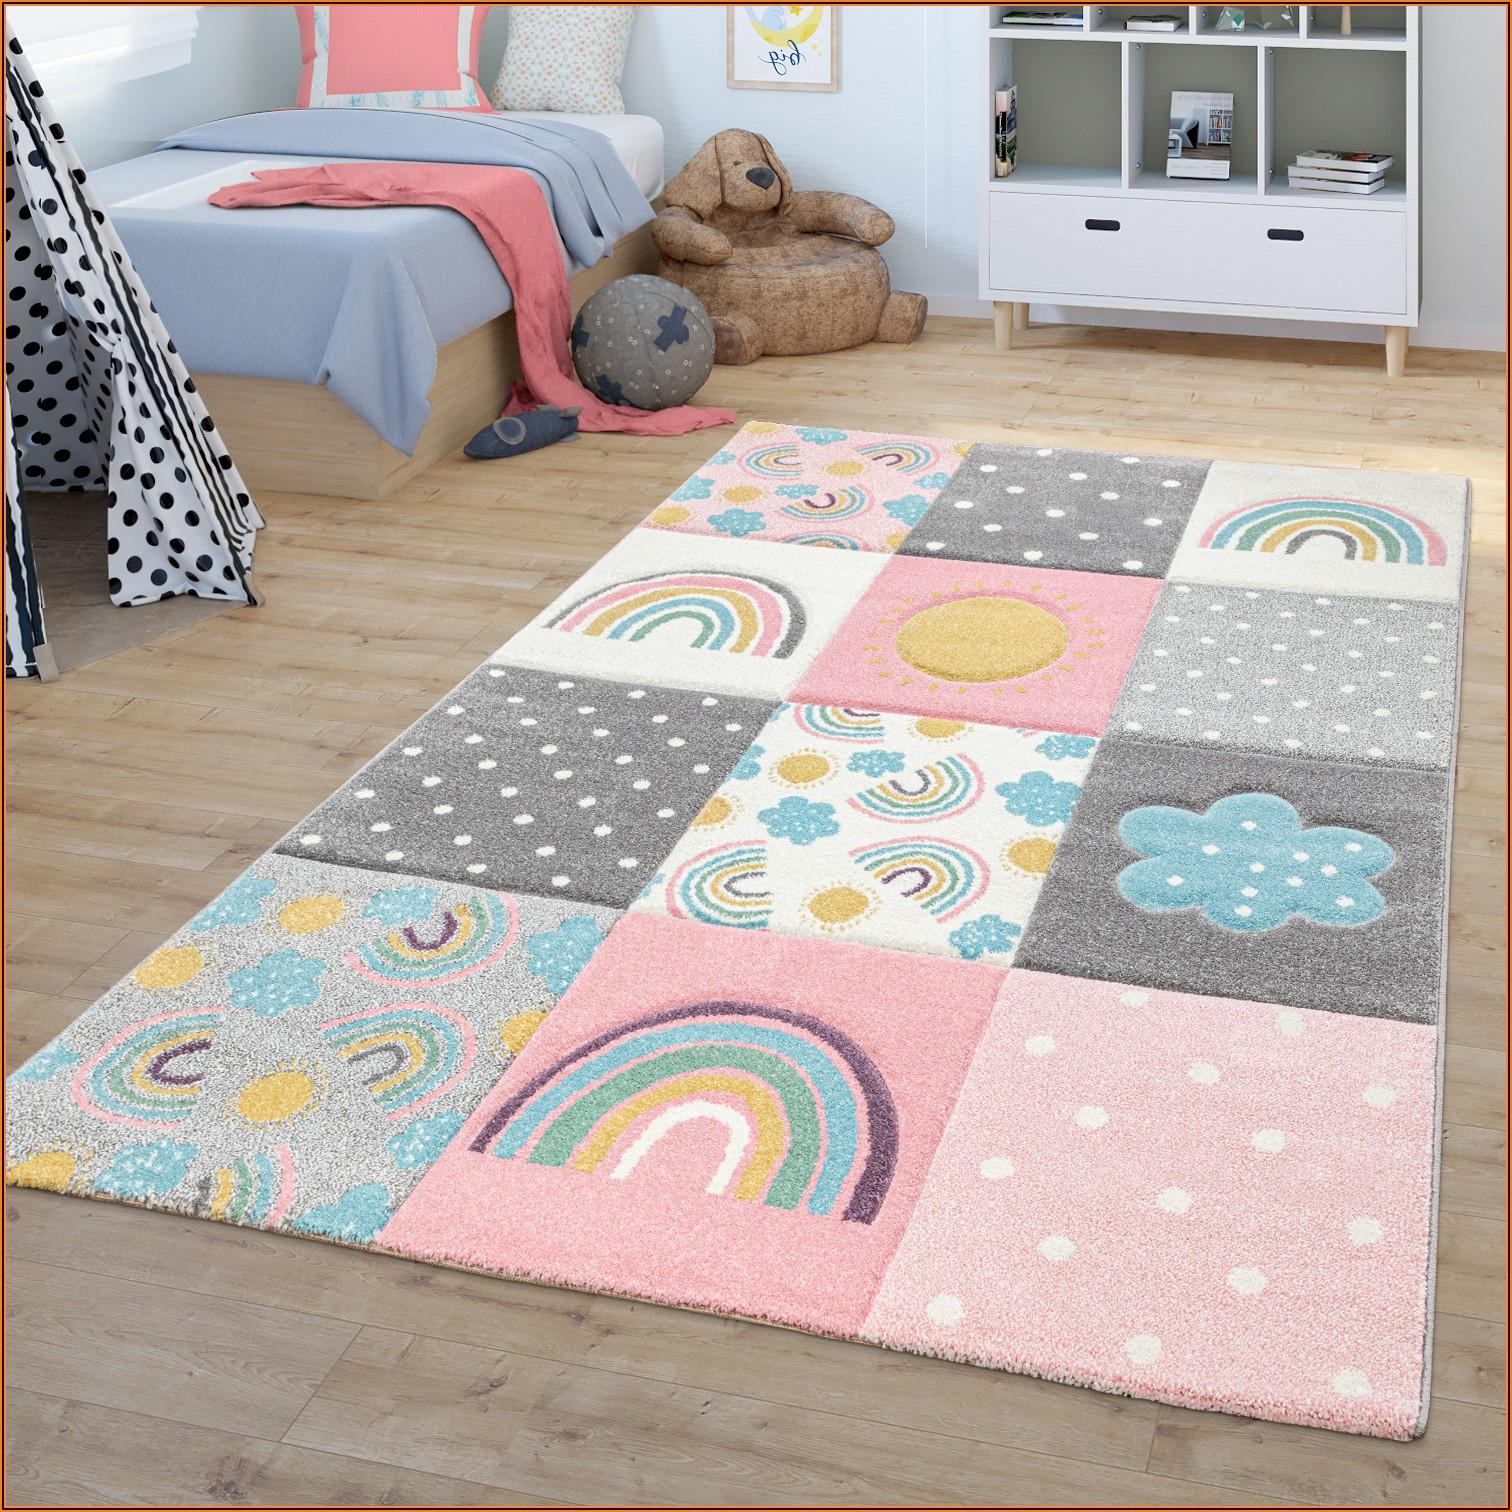 Kinderzimmer Teppich Grau